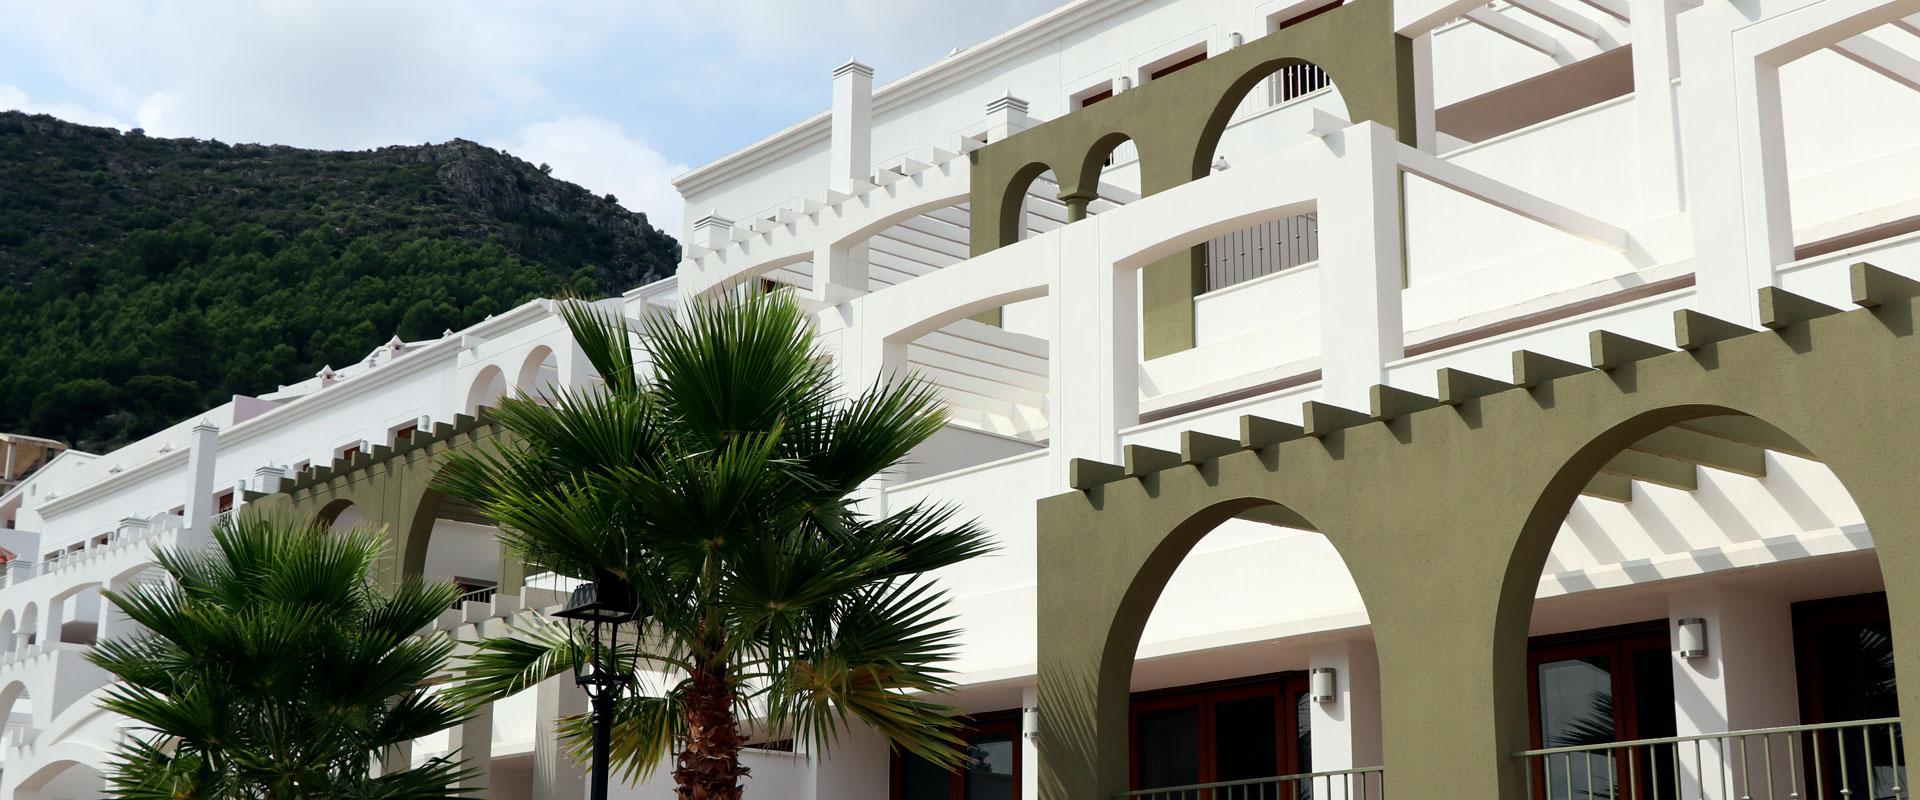 viviendas xeresa del monte gandia asa promoción inmobiliaria